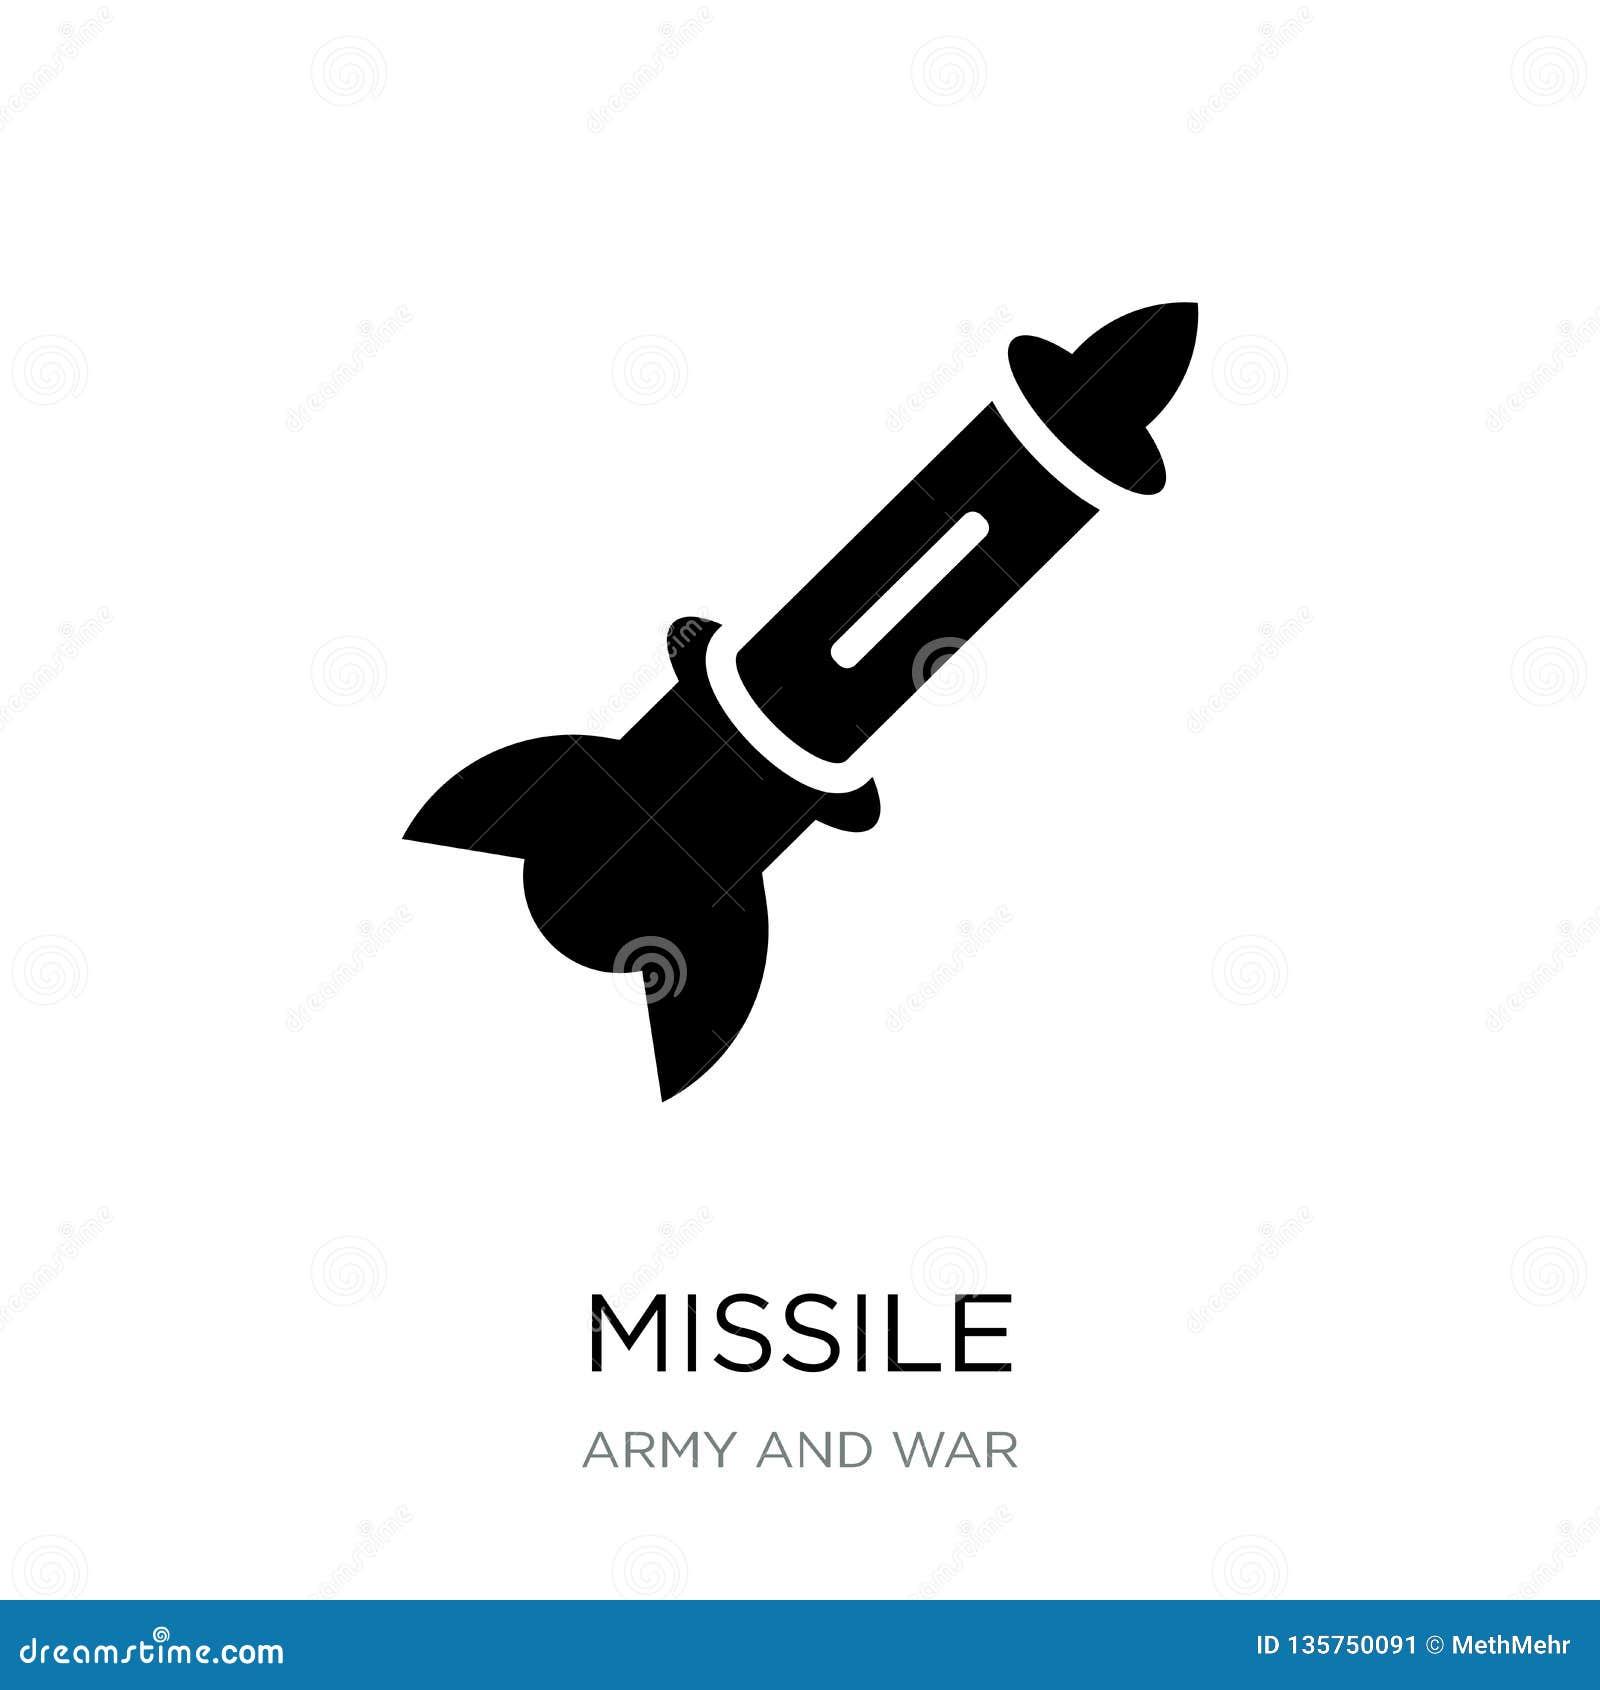 ícone do míssil no estilo na moda do projeto ícone do míssil isolado no fundo branco símbolo liso simples e moderno do ícone do v